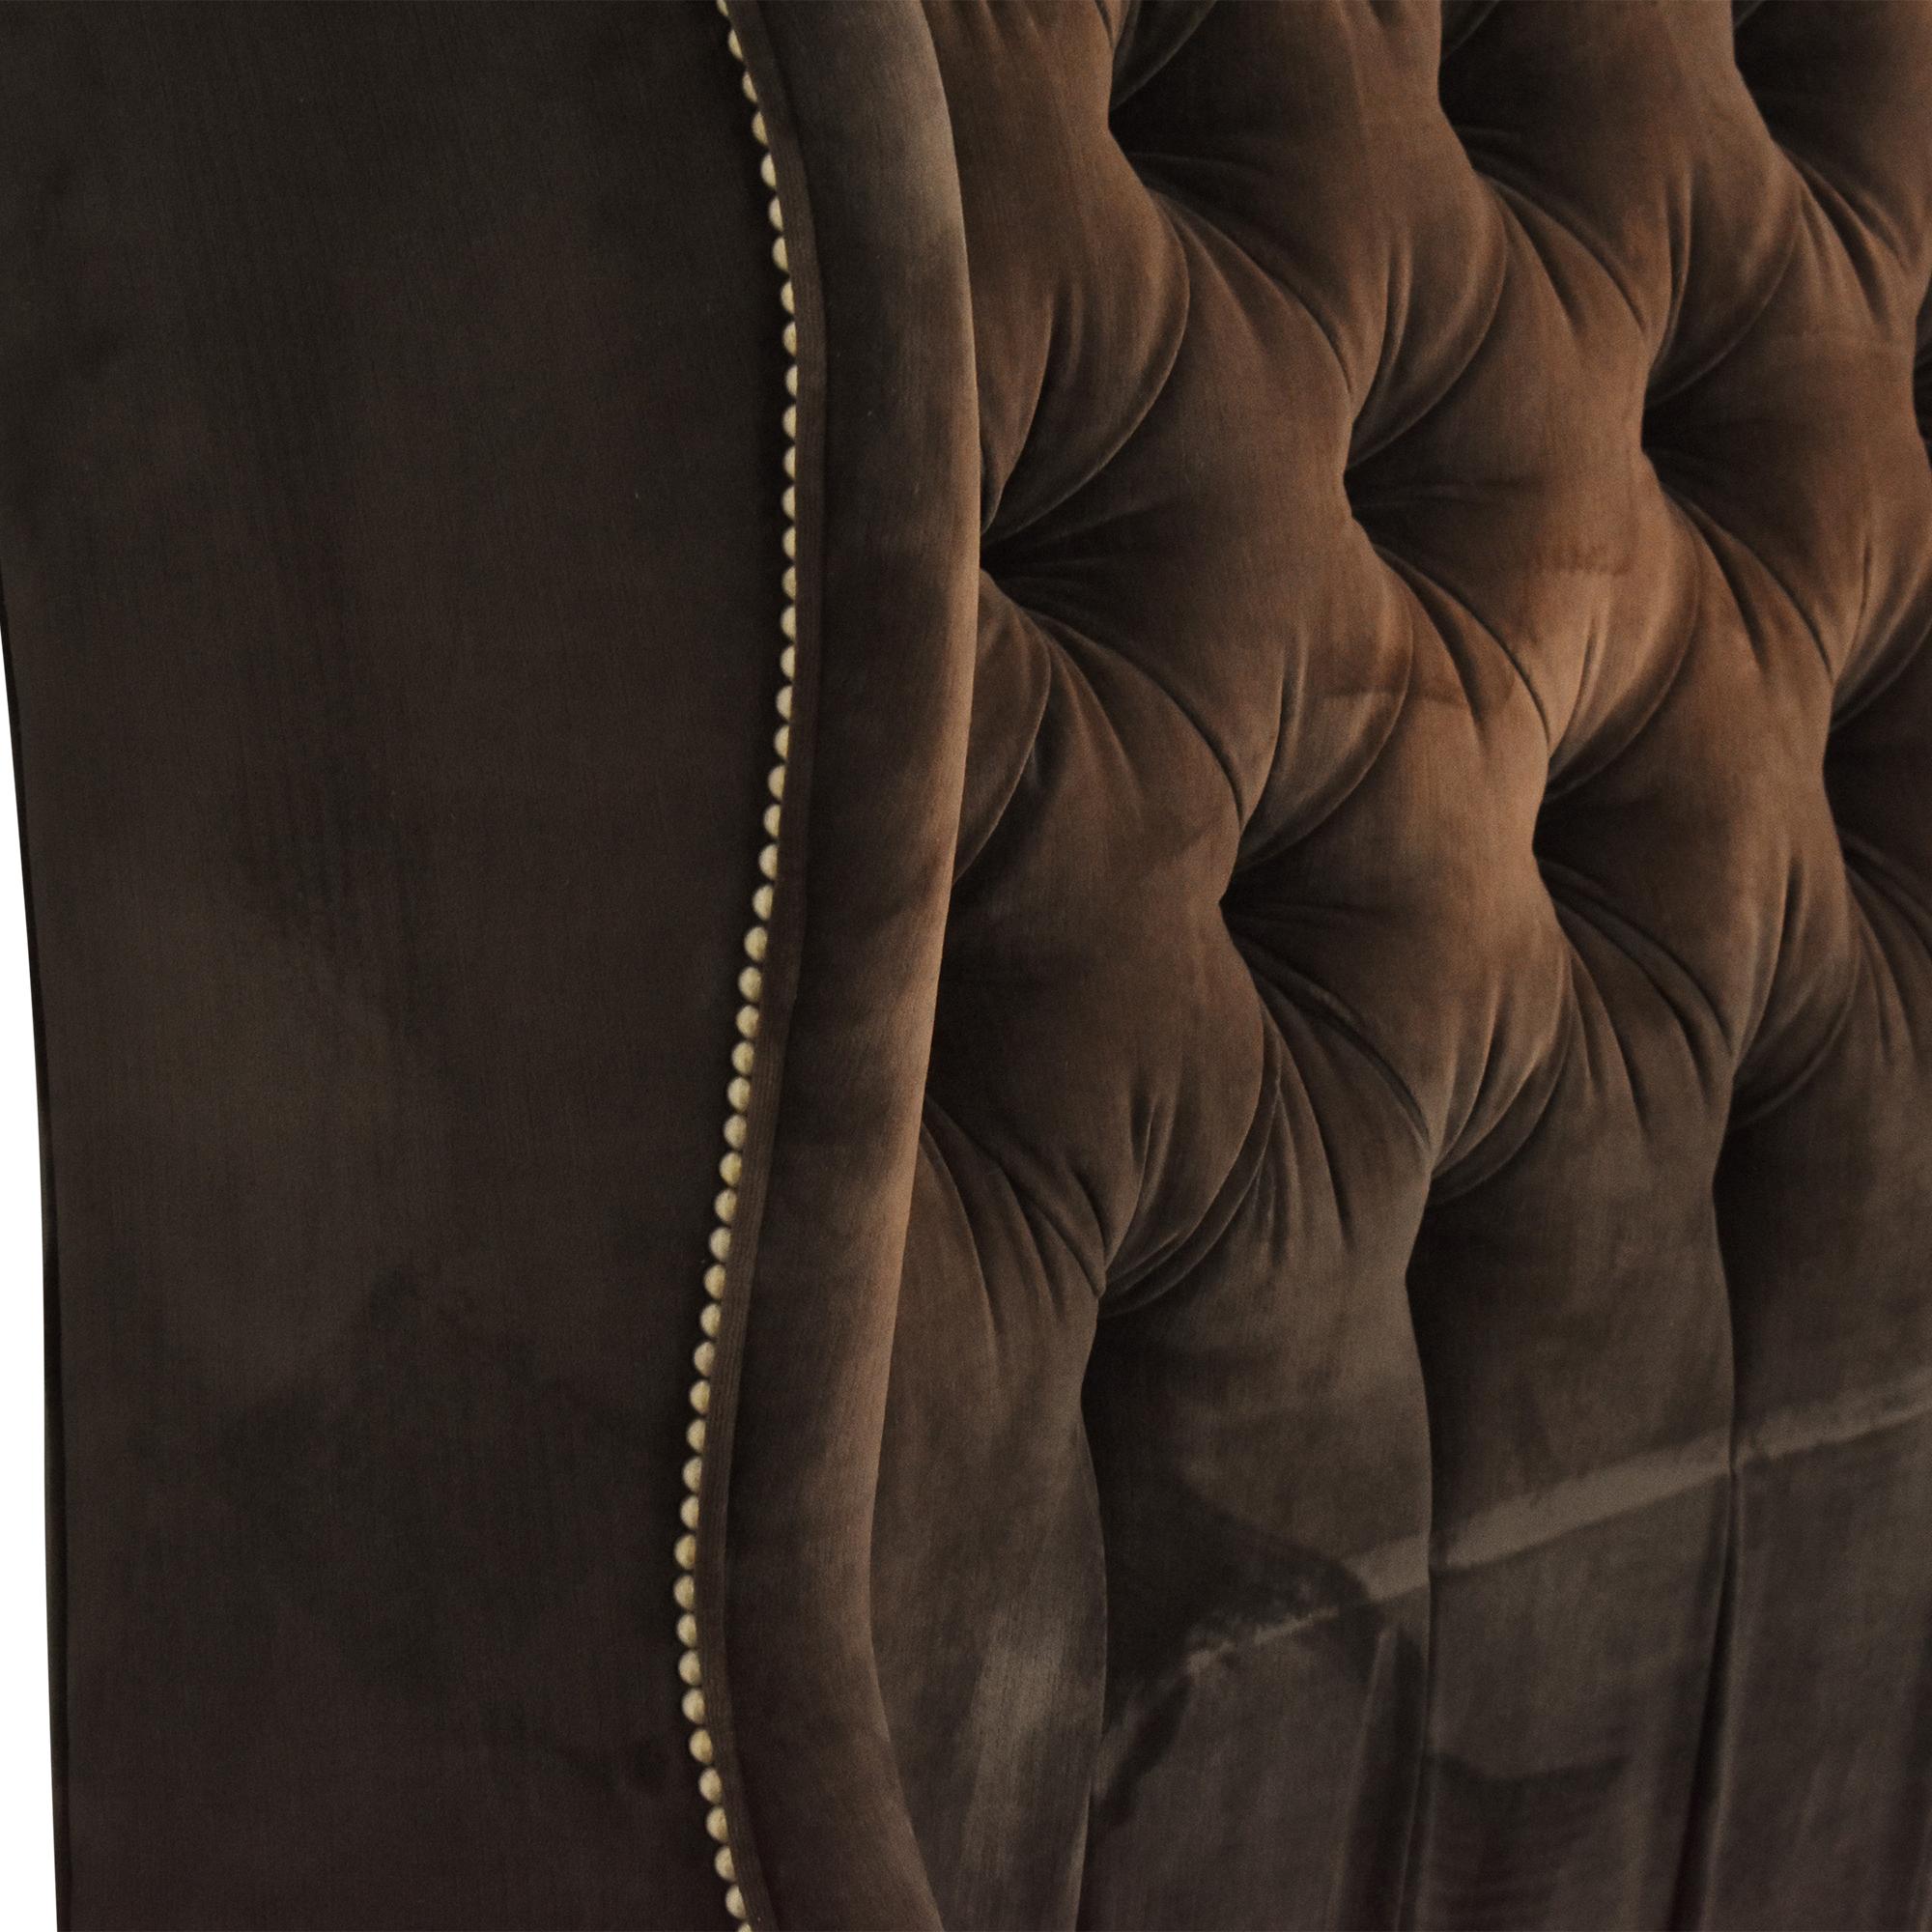 Arhaus Arhaus Barrister Tufted Queen Bed discount